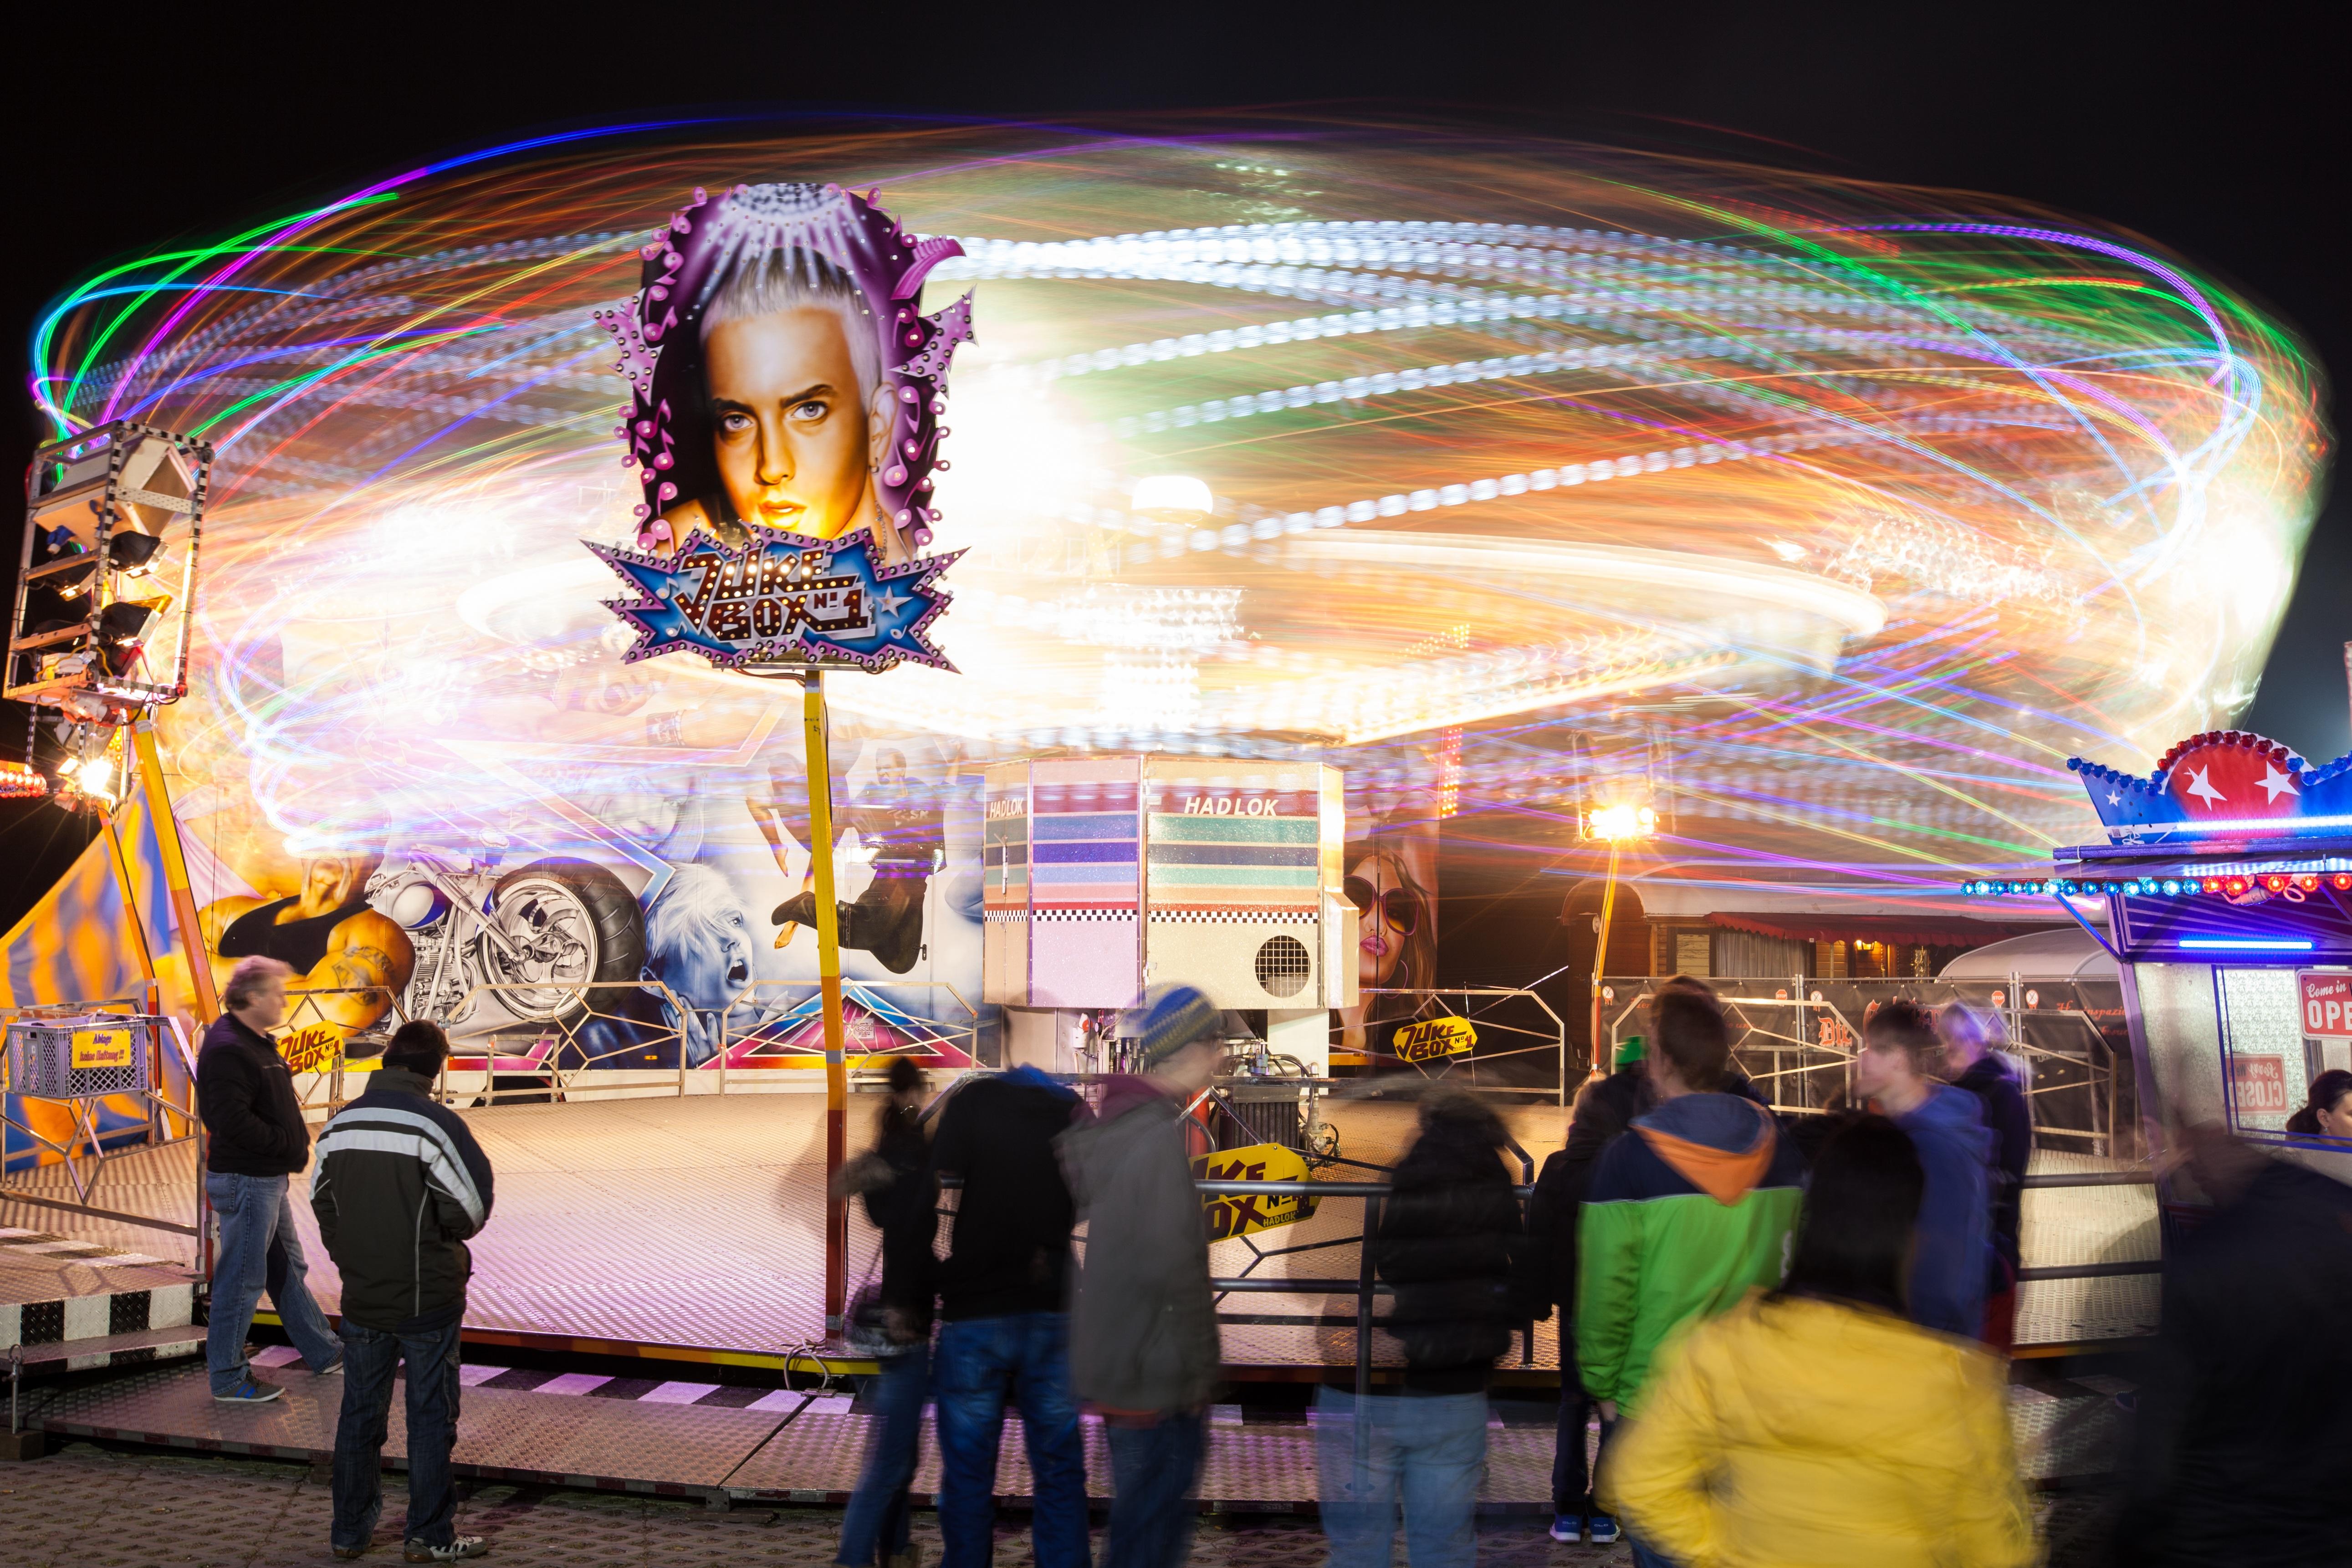 Joy at the fairground